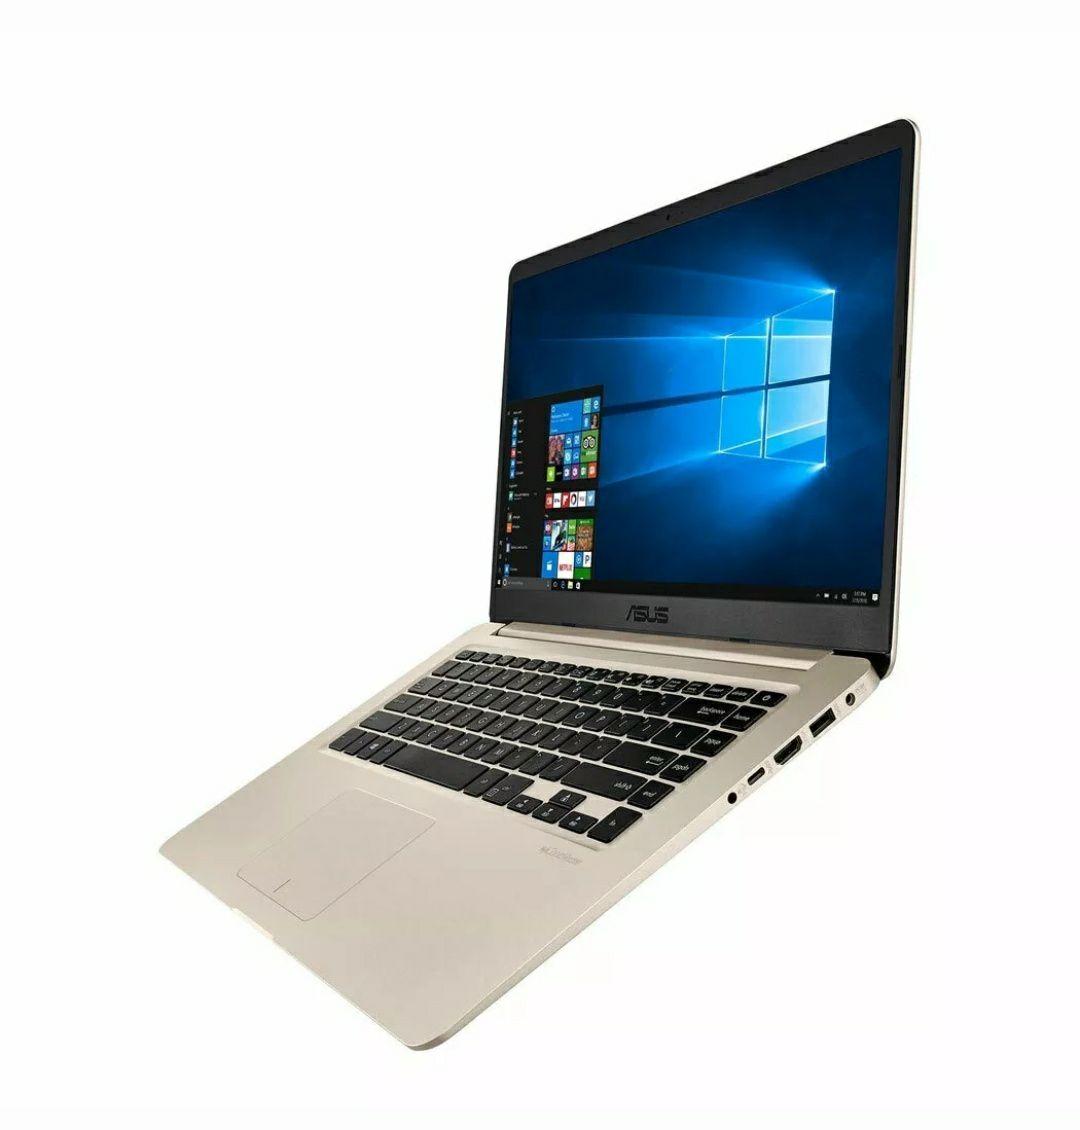 *Refurb* Asus Vivobook Slim S510UQ-BQ520T 15.6 inch FHD i7-8550U 8GB 256GB SSD Gold £499.99 with code @ Electrical-Deals eBay